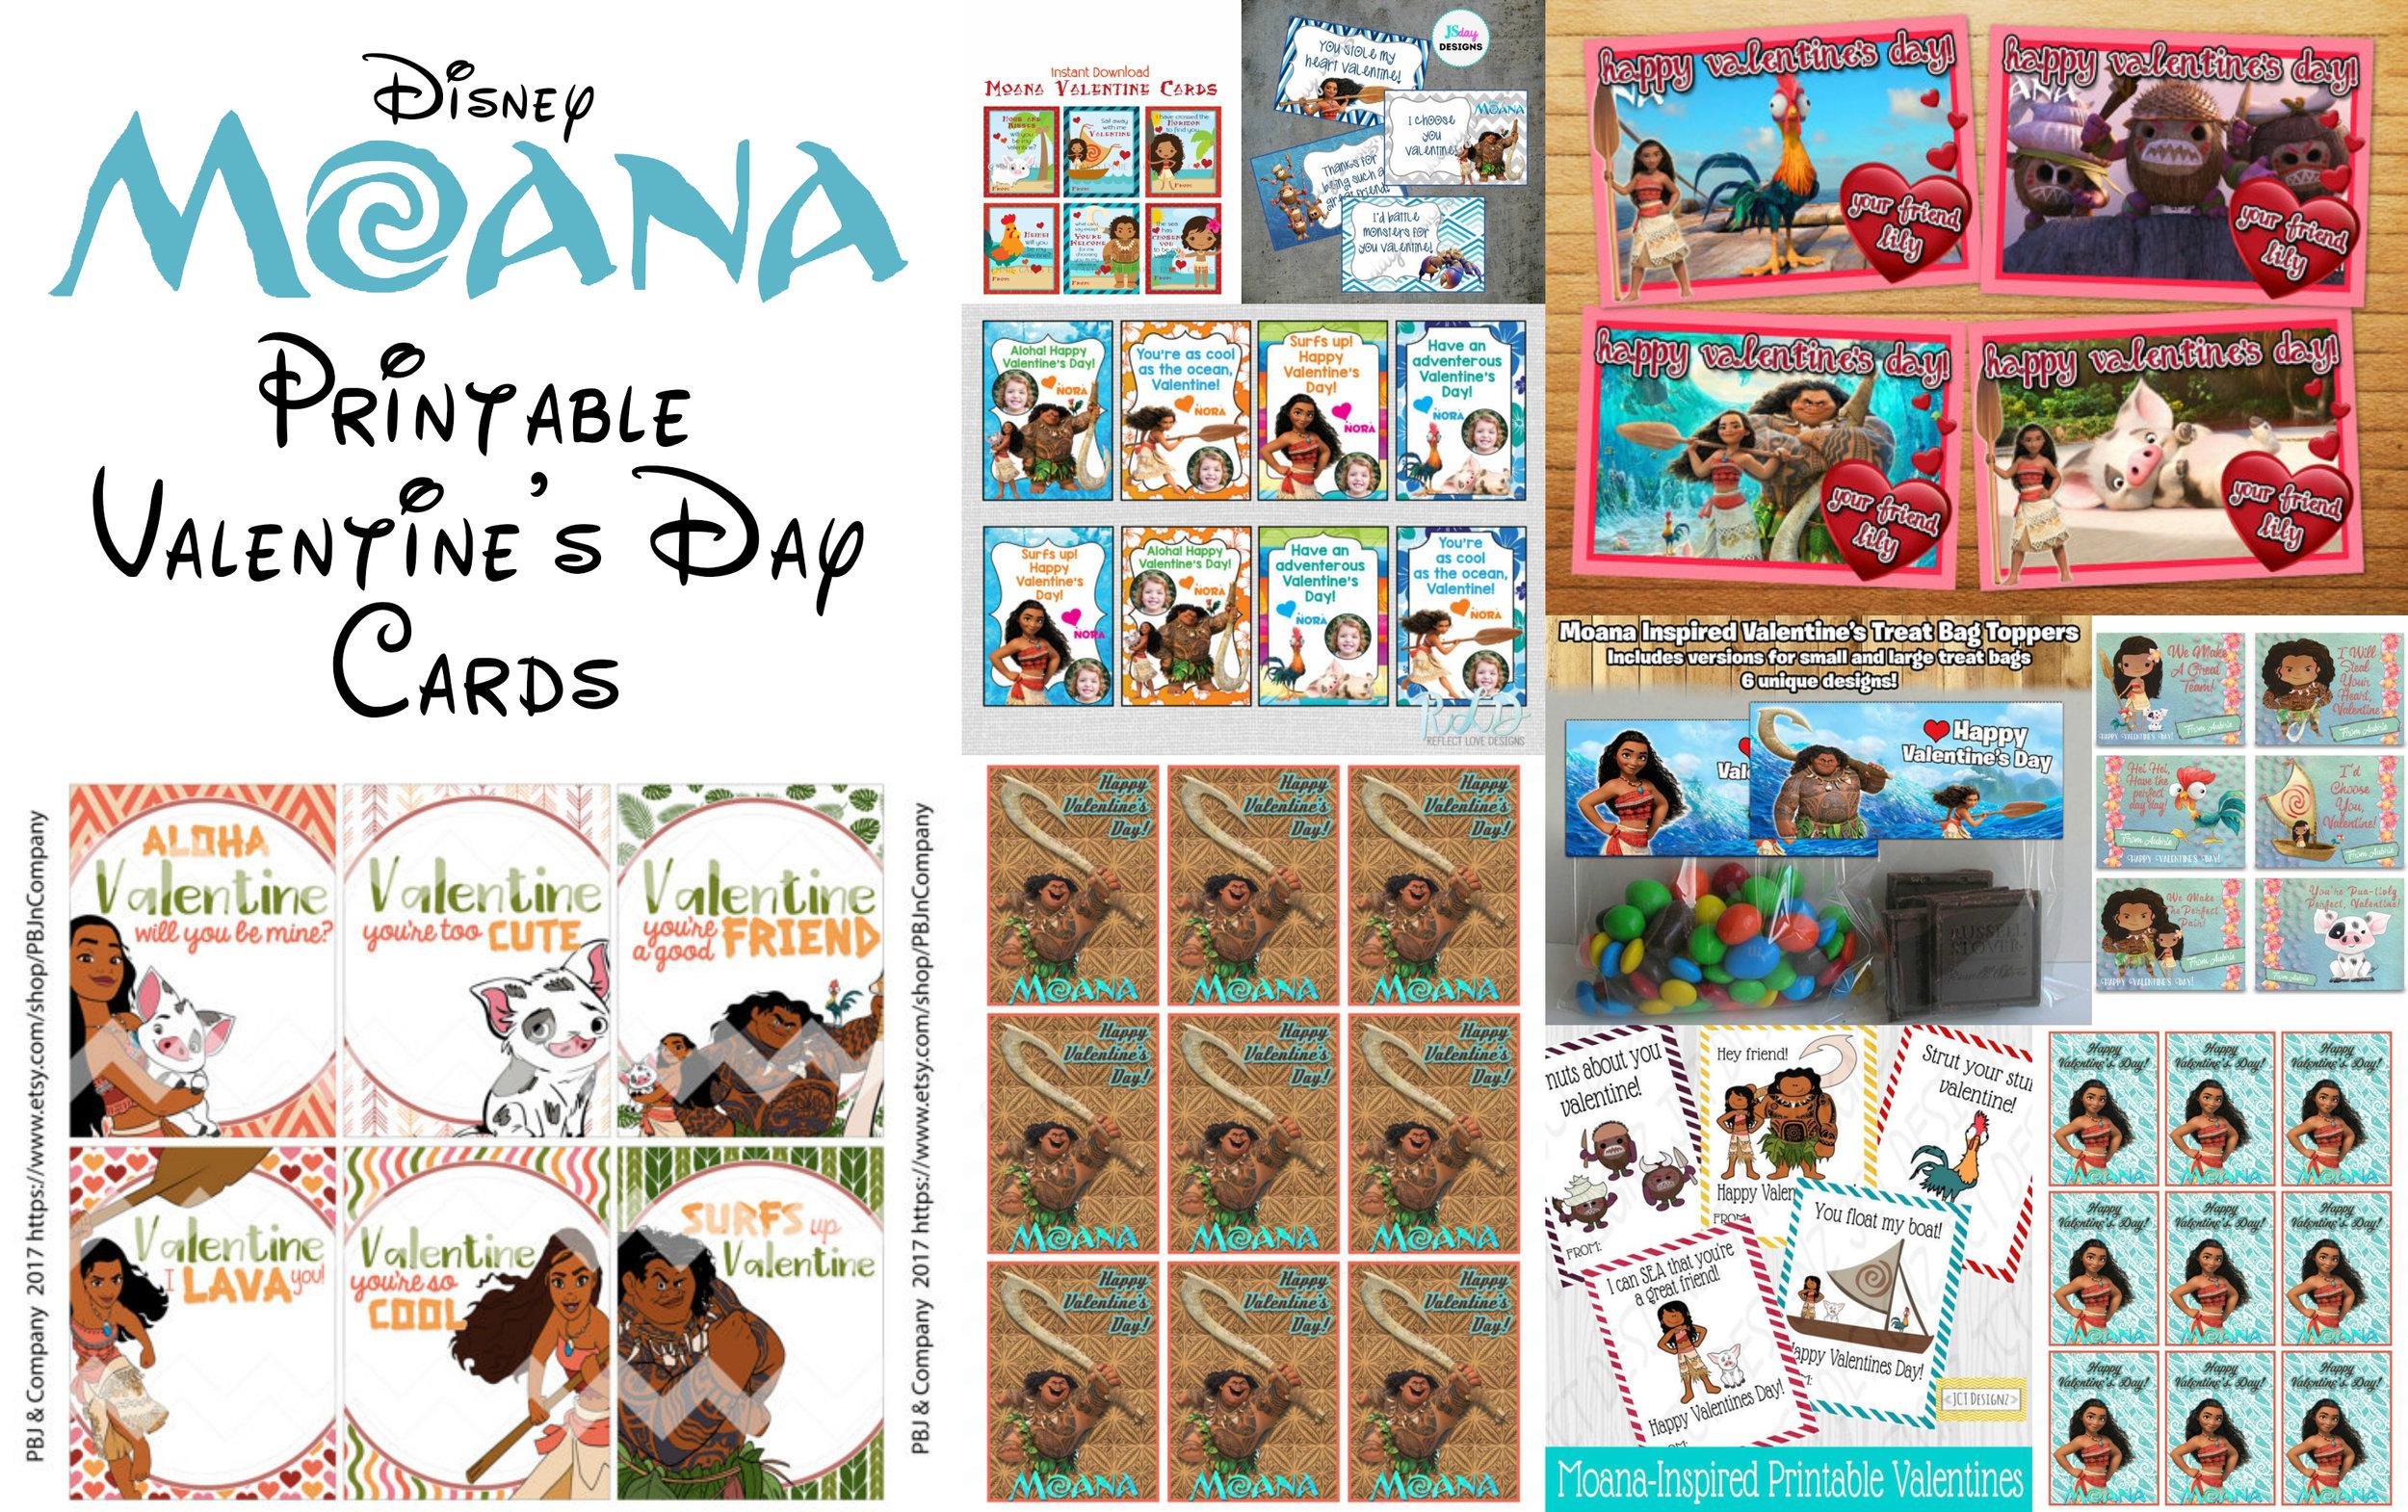 Disney Moana Printable Valentine Cards For Kids